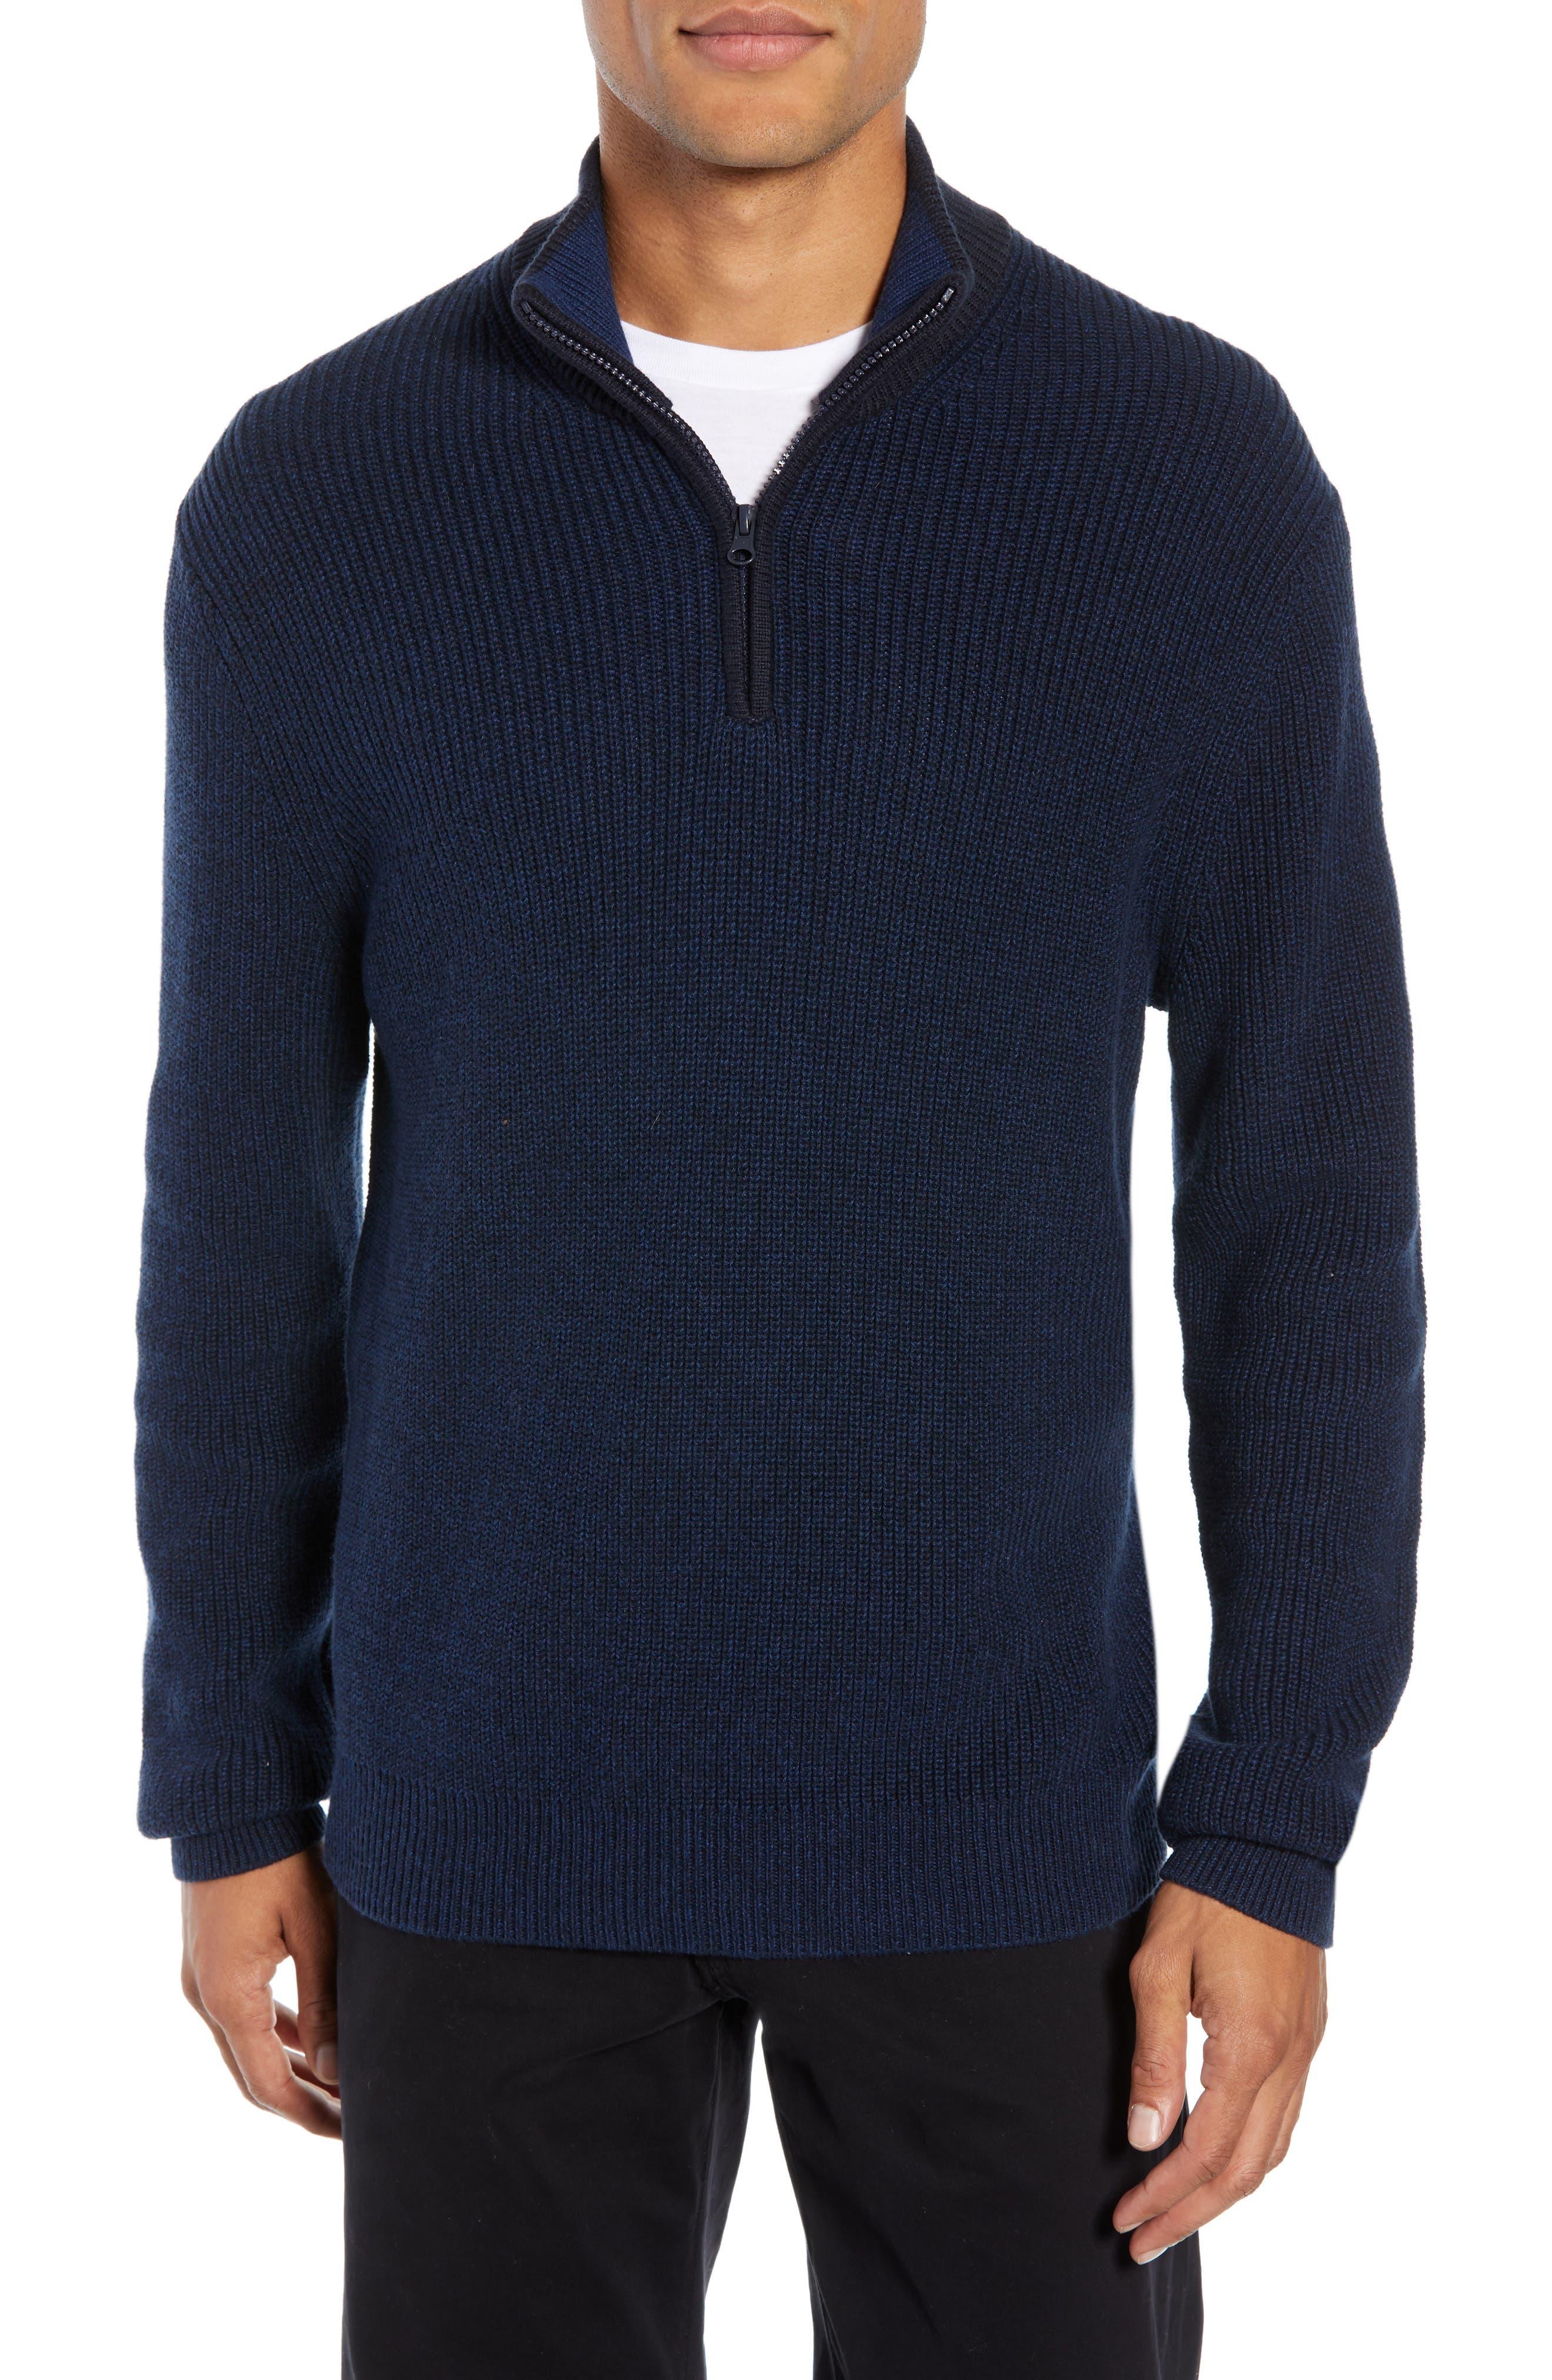 Fillmore Quarter Zip Sweater,                             Main thumbnail 1, color,                             NAVY